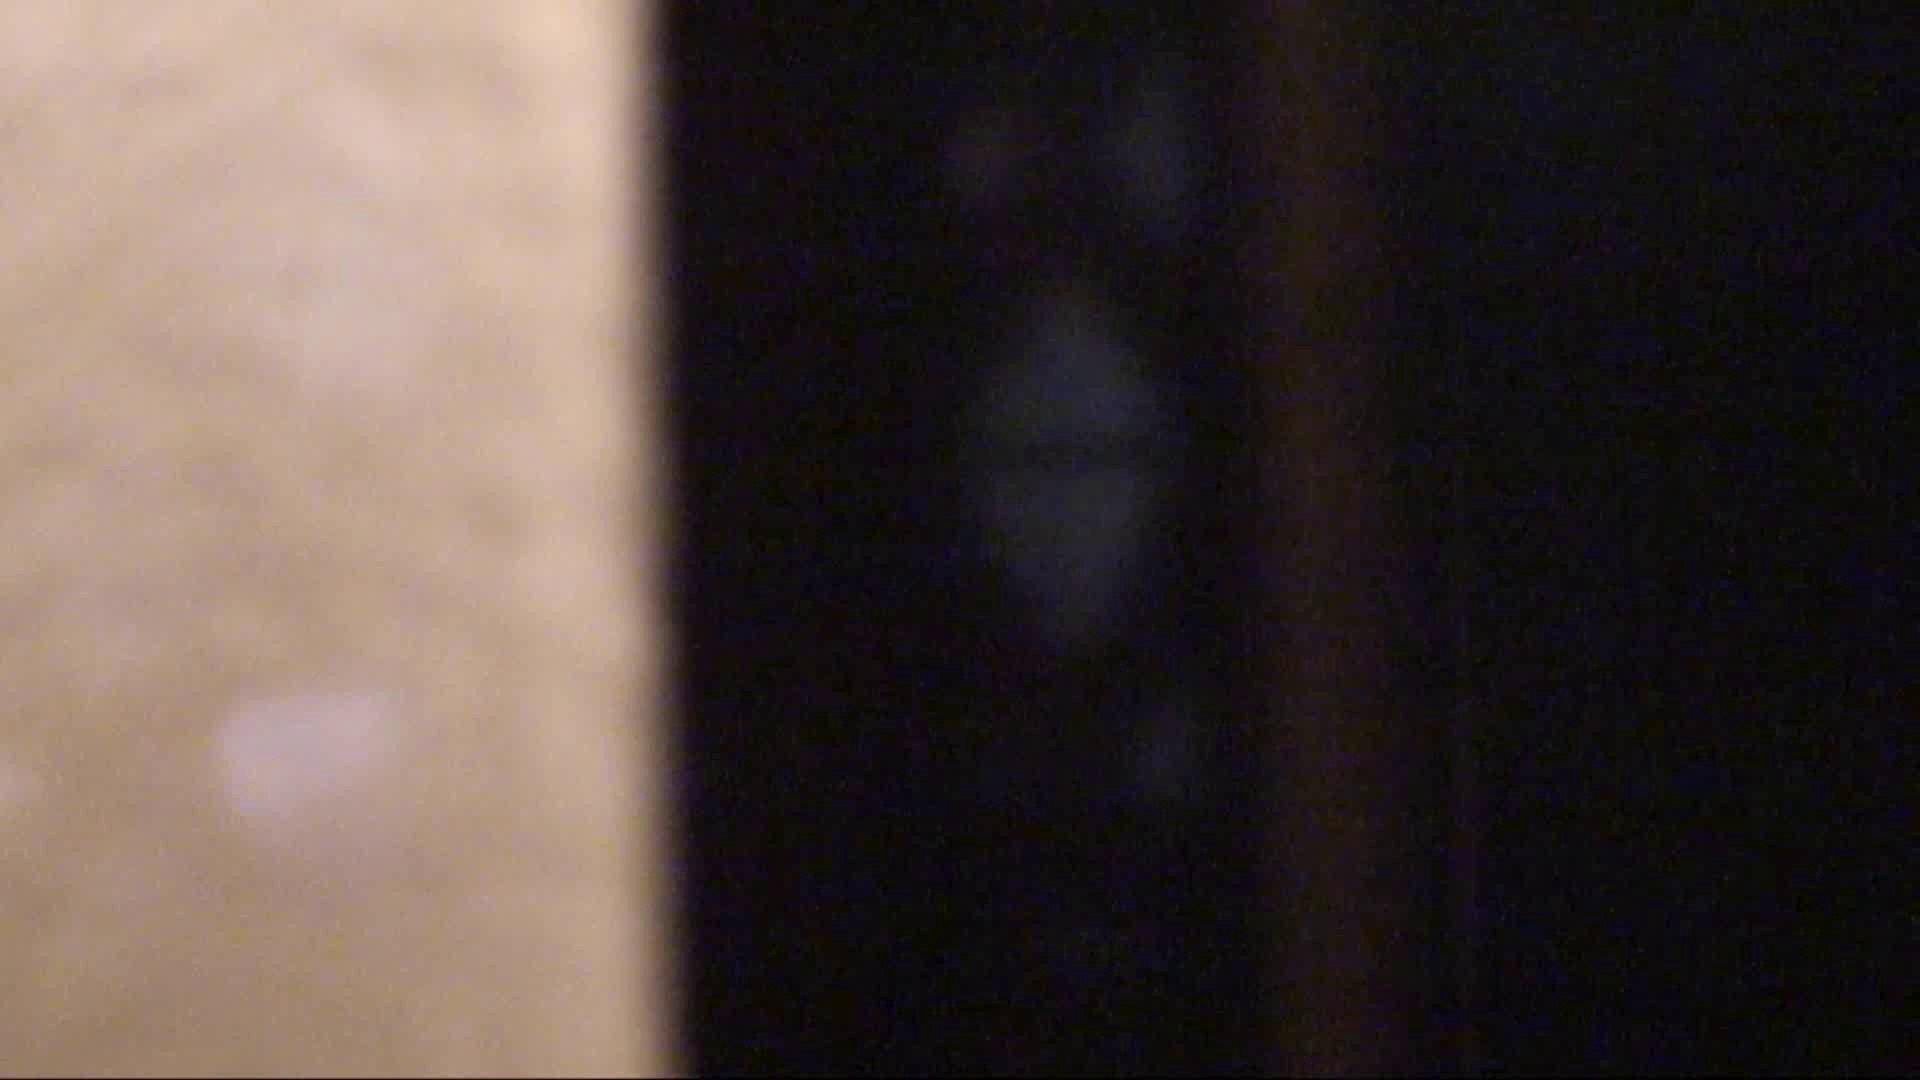 vol.01必見!白肌嬢の乳首が丸見え。極上美人のすっぴん顔をハイビジョンで! 美乳 | 美人編  71画像 10